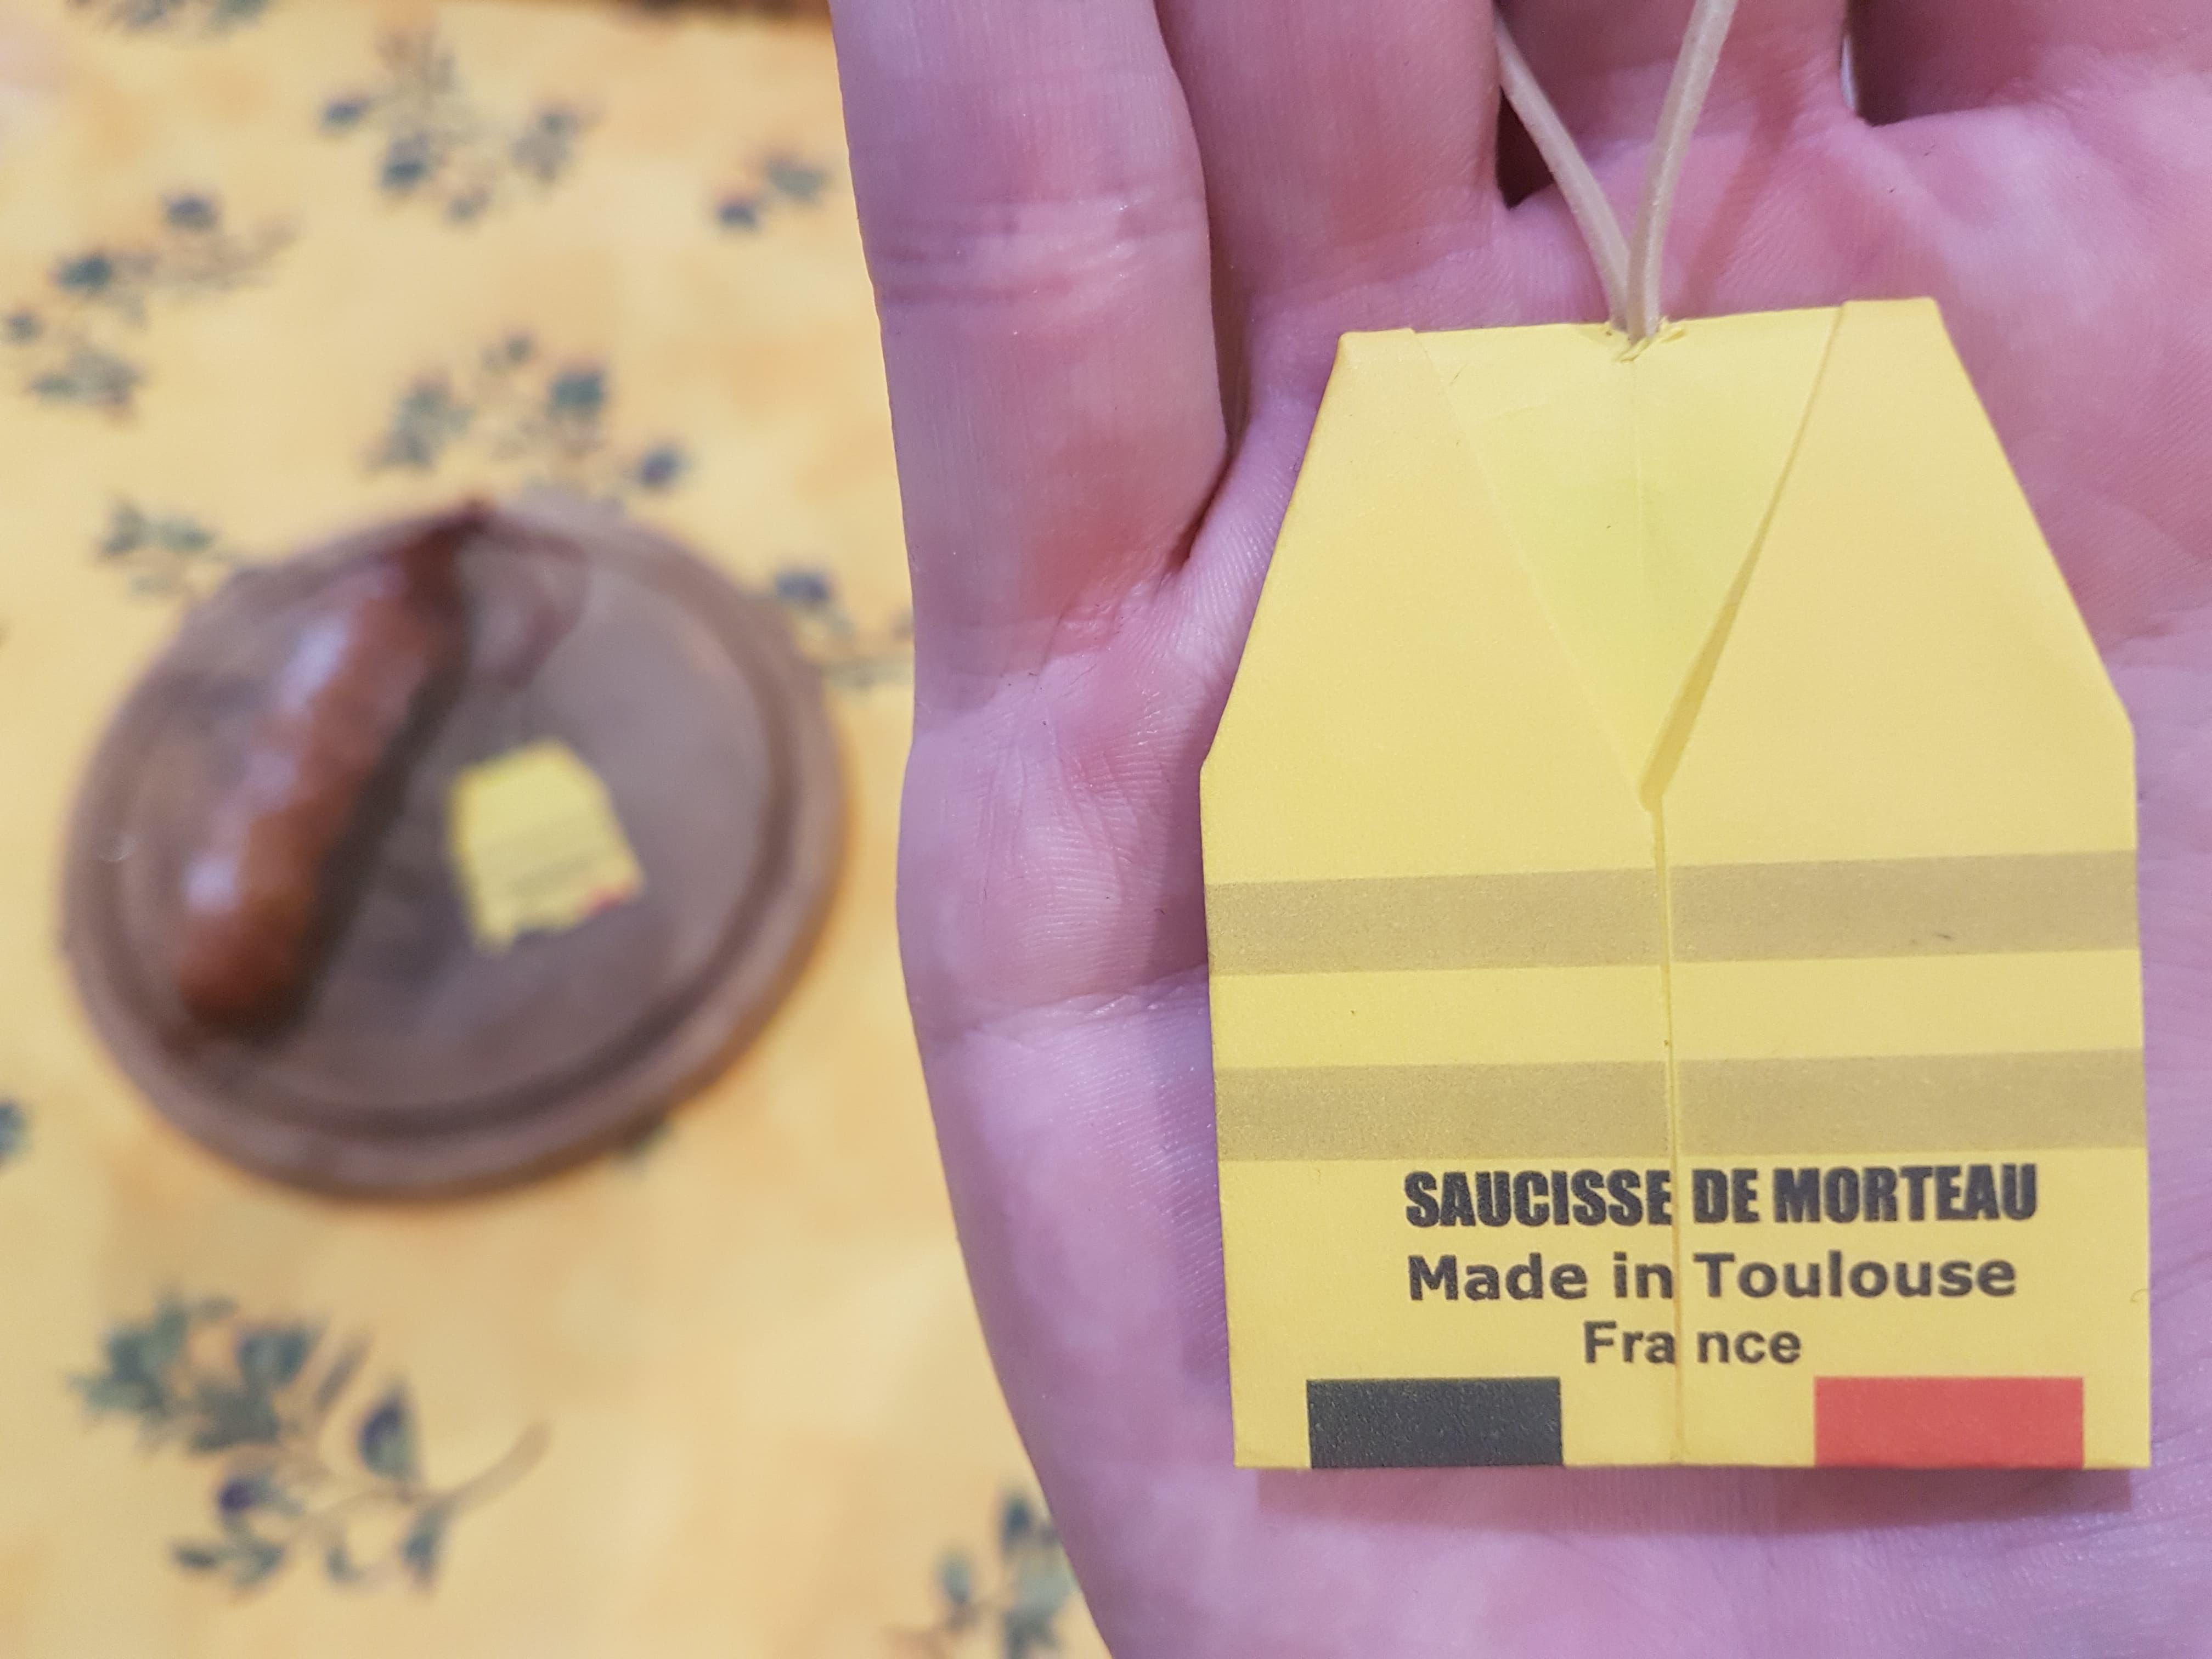 Le gilet jaune en origami